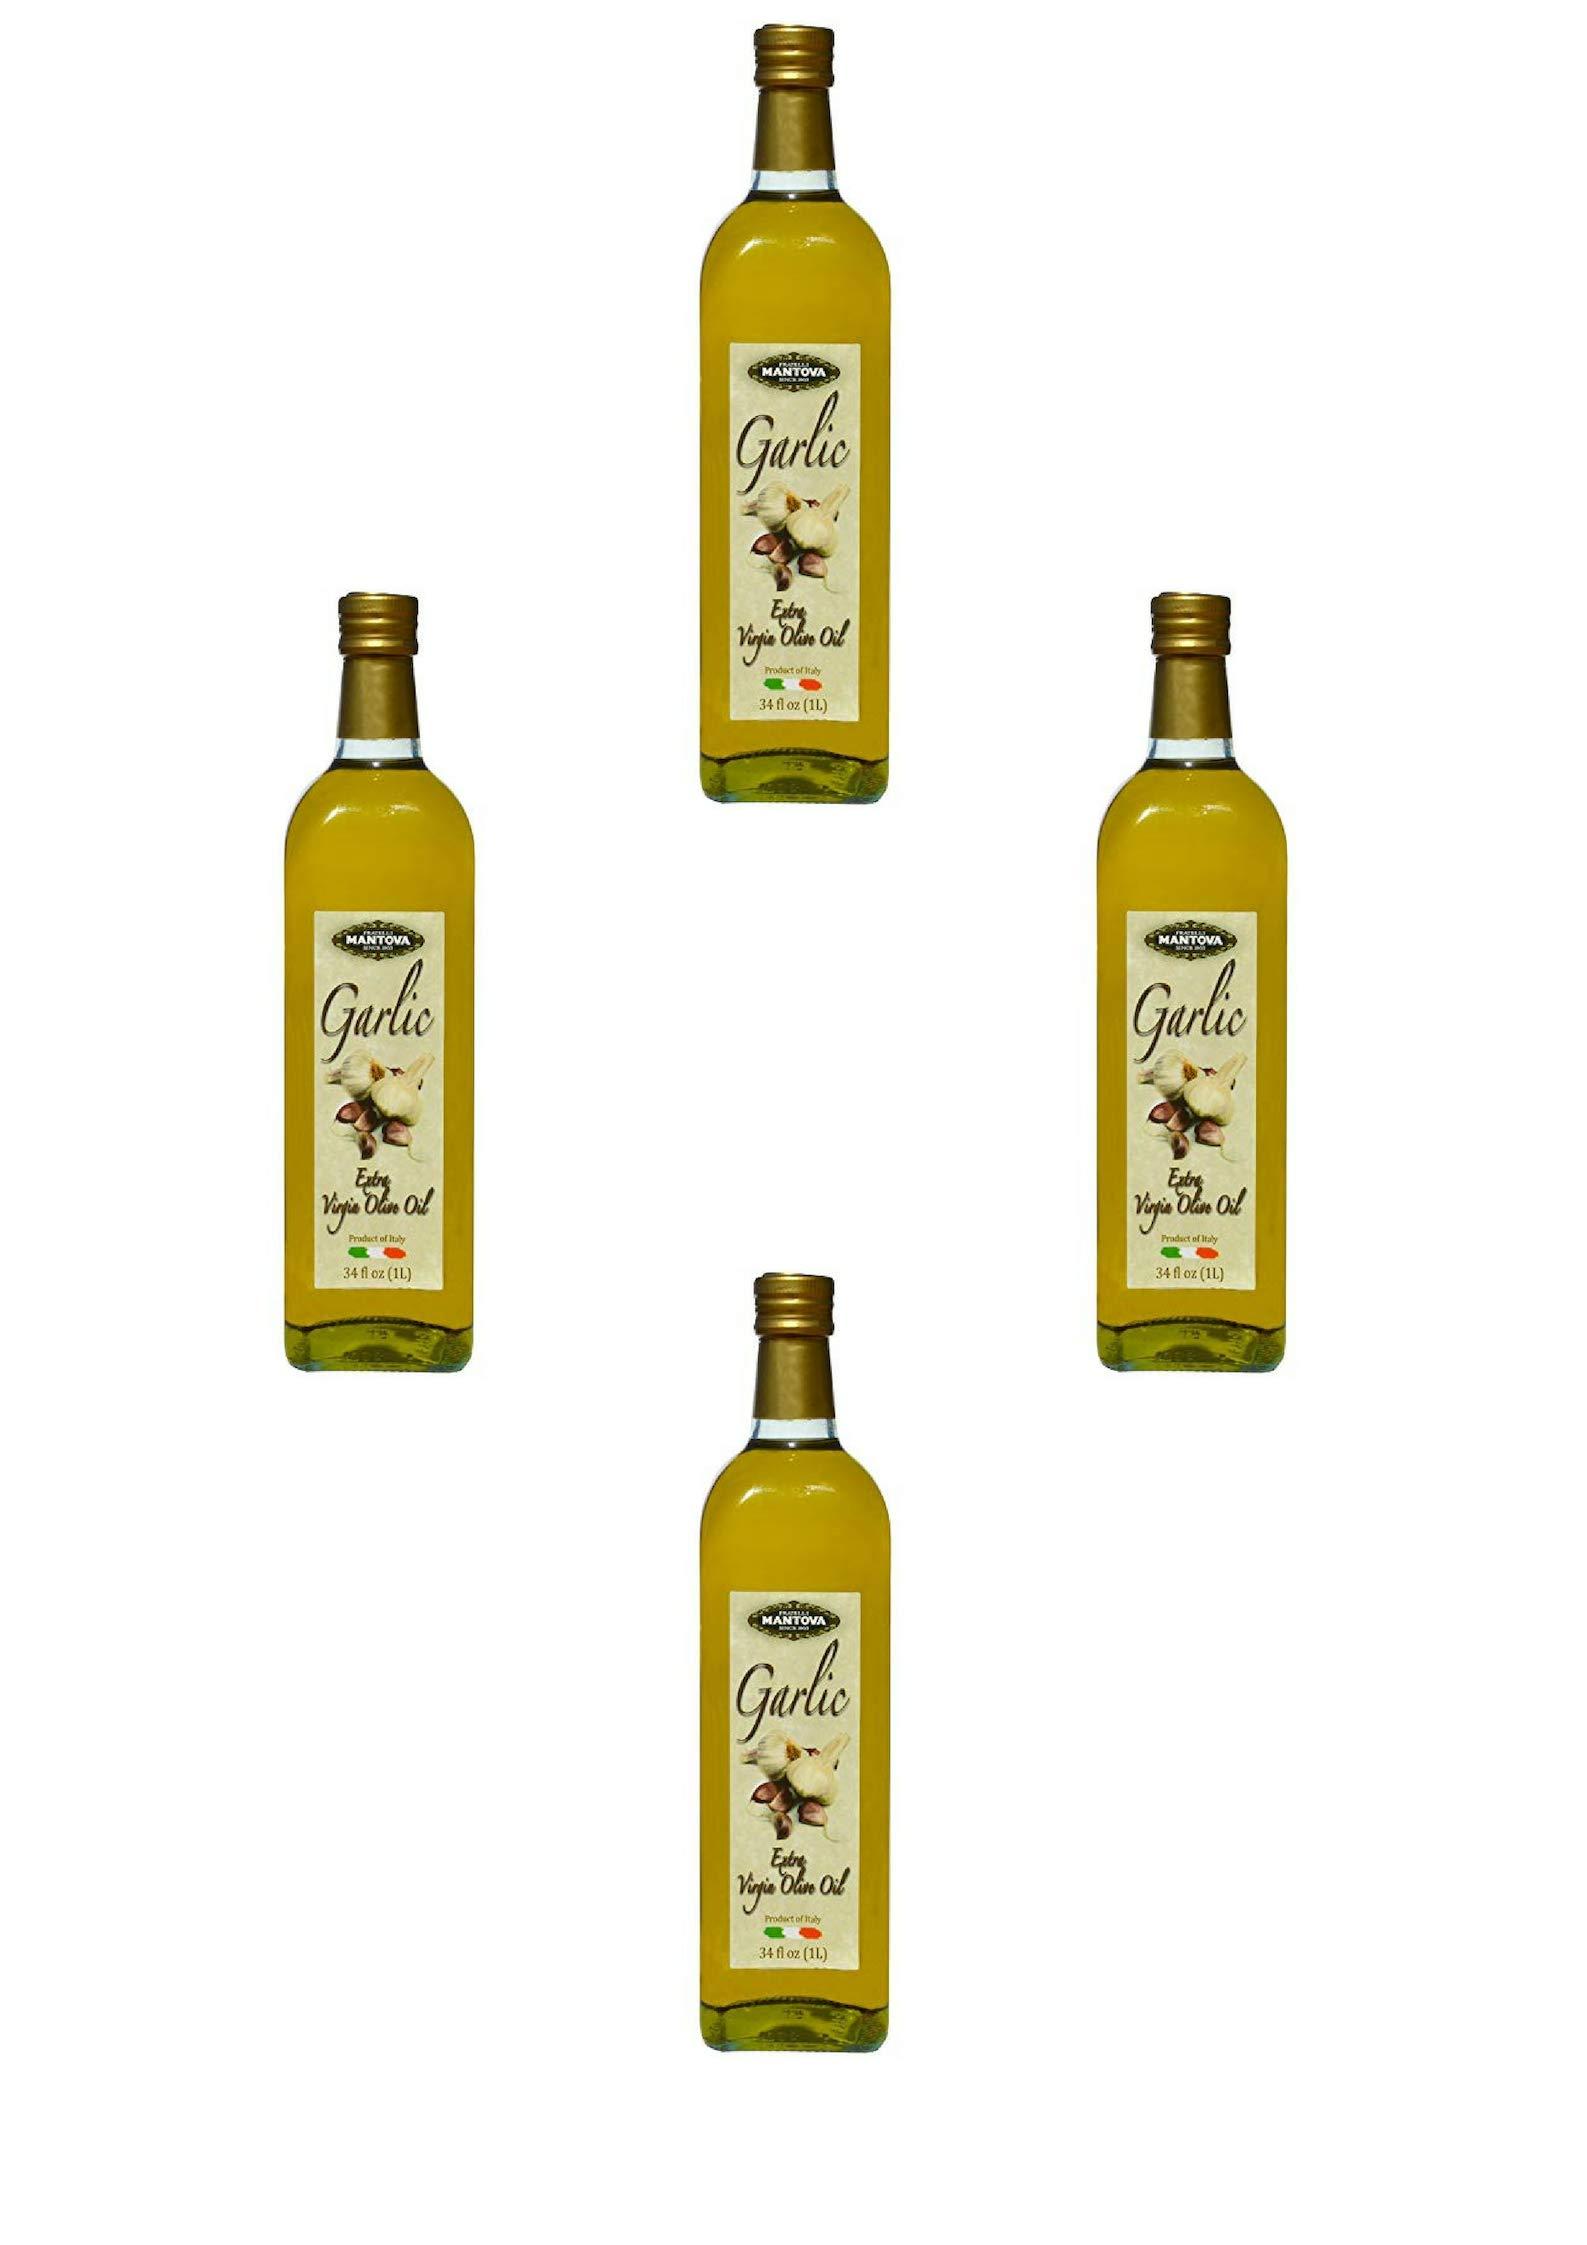 Mantova Garlic Italian Extra Virgin Olive Oil Bottles, 34 oz, 2 Pack (4 Pack) by Mantova